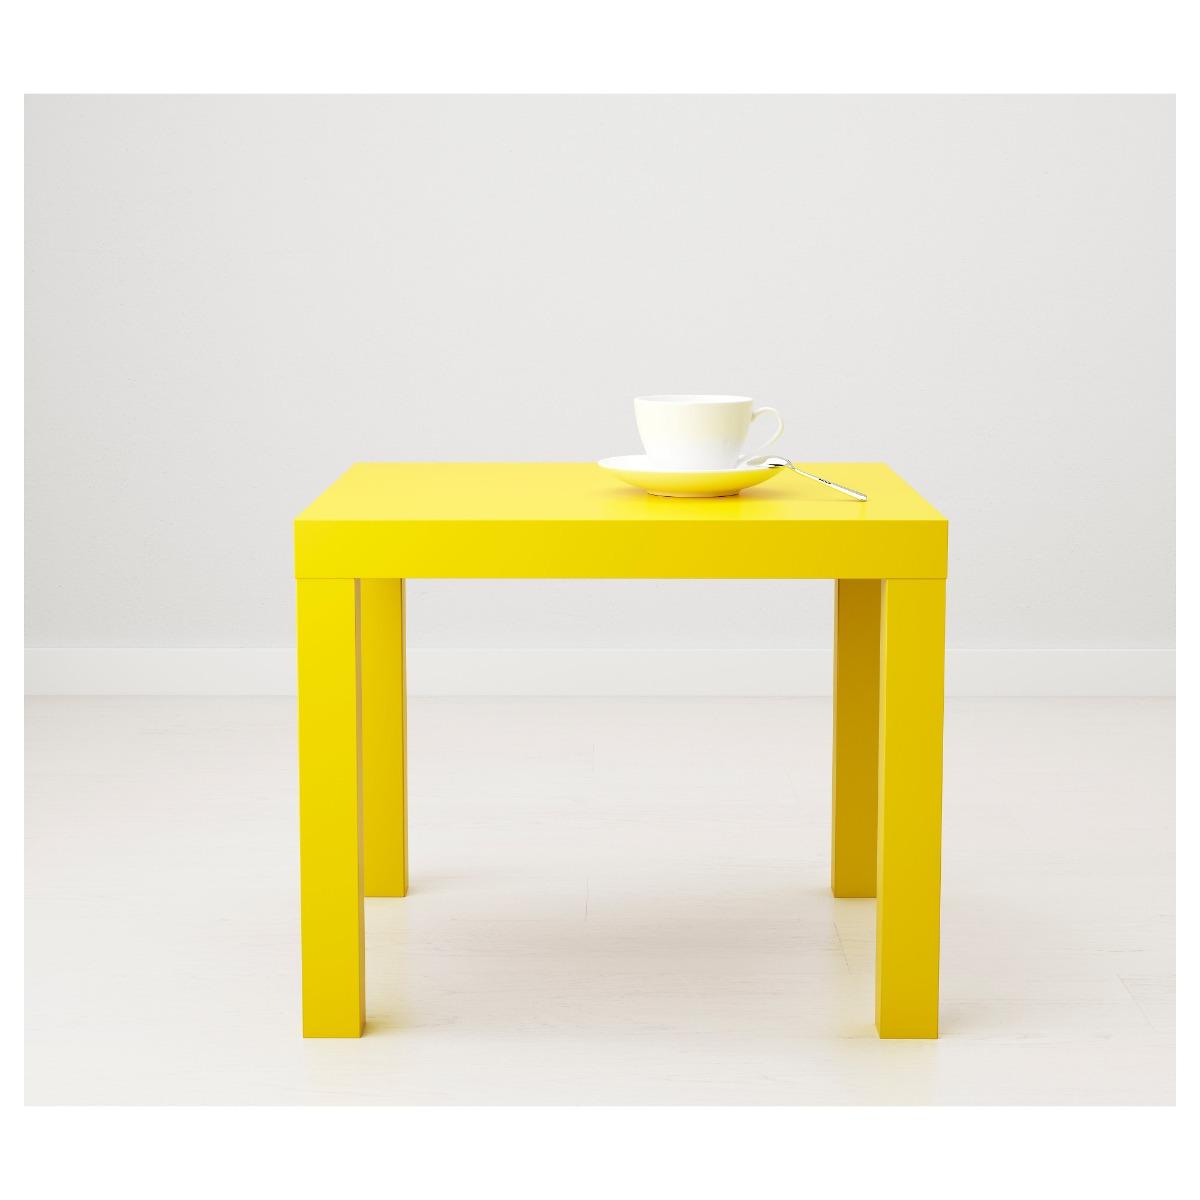 Ikea lack mesa auxiliar amarillo 1 en mercado libre - Ikea mesa lack blanca ...